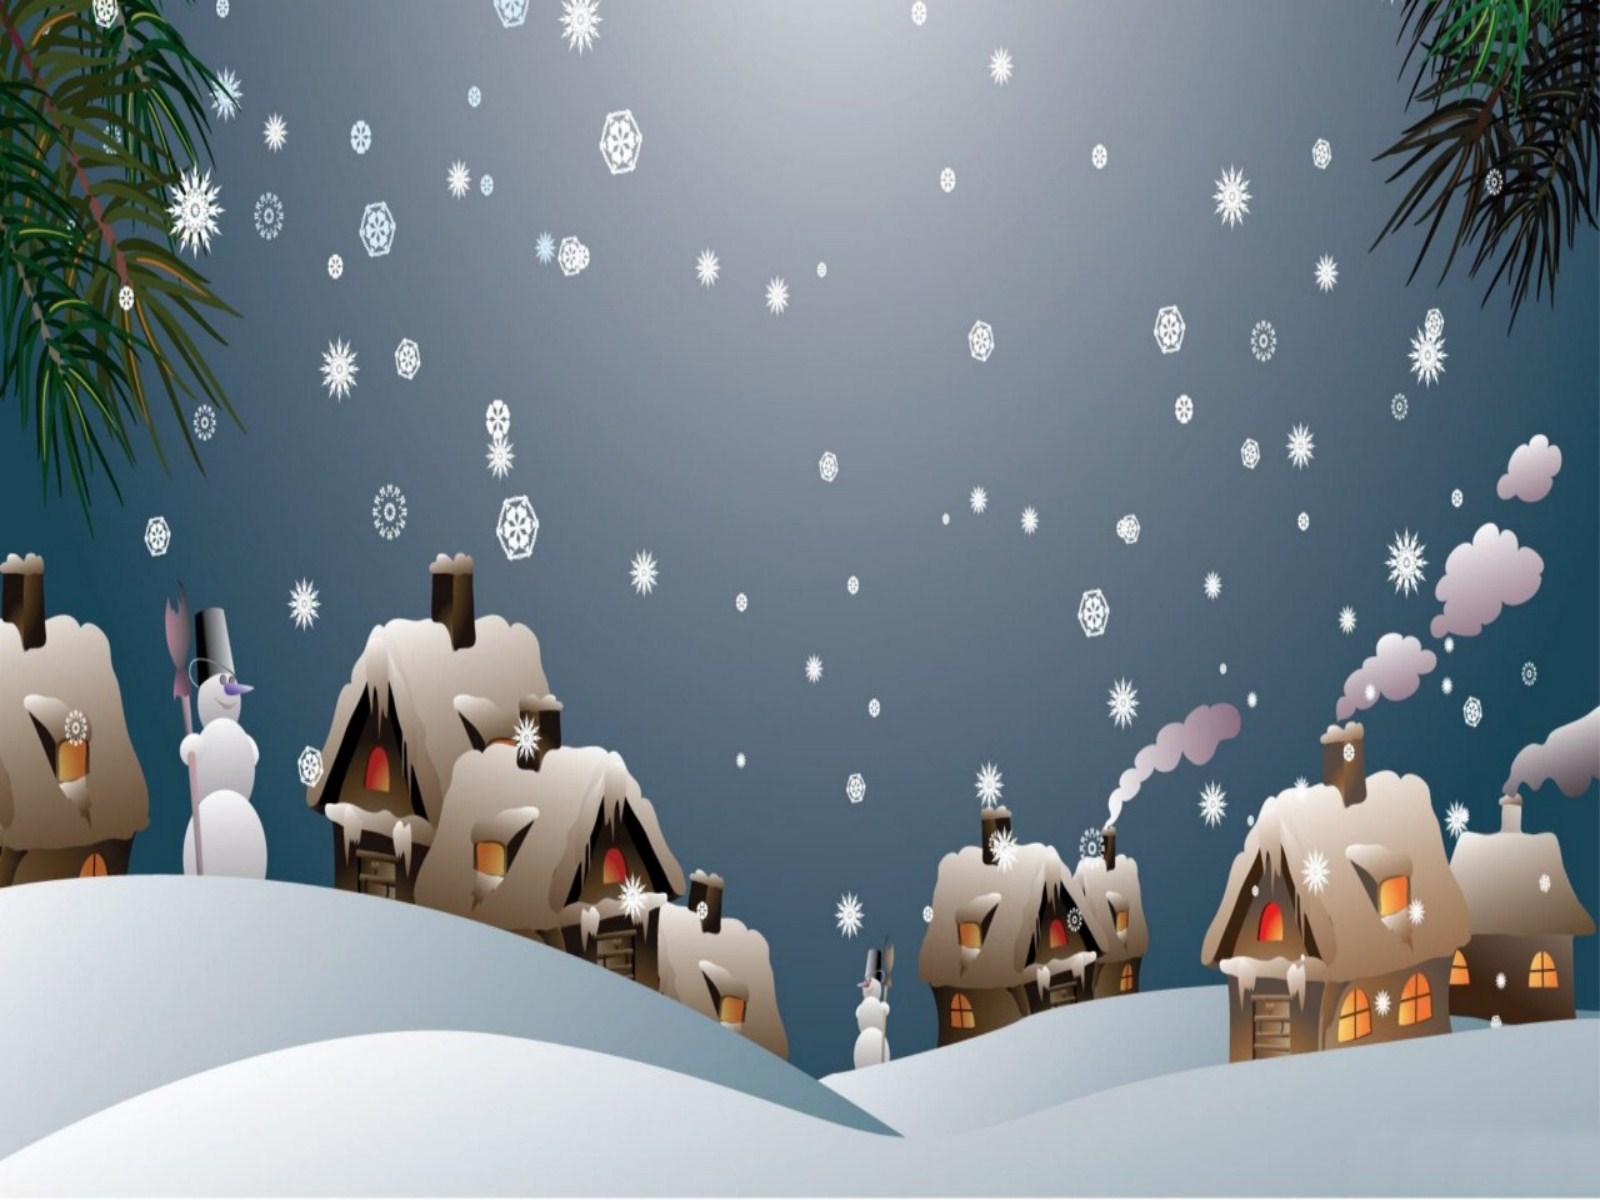 Free Ipad Wallpaper Christmas: Free Animated Snowy Christmas Wallpaper